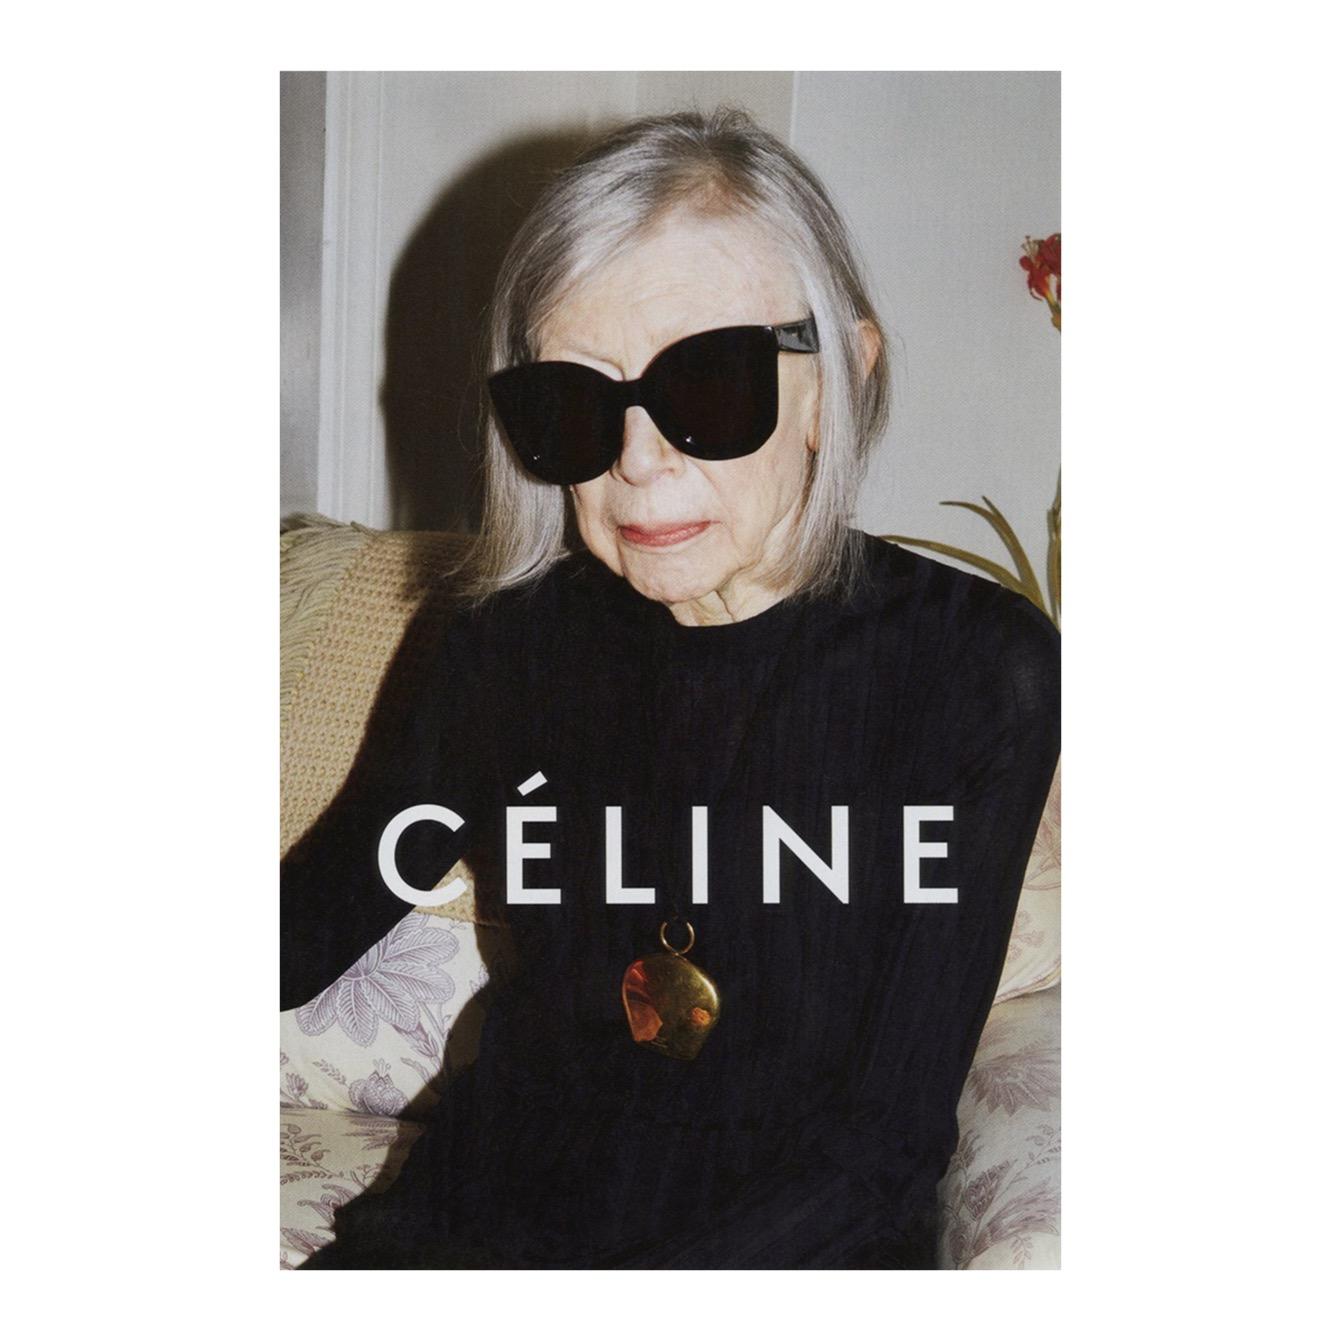 iconic fashion photographer juergen teller celine